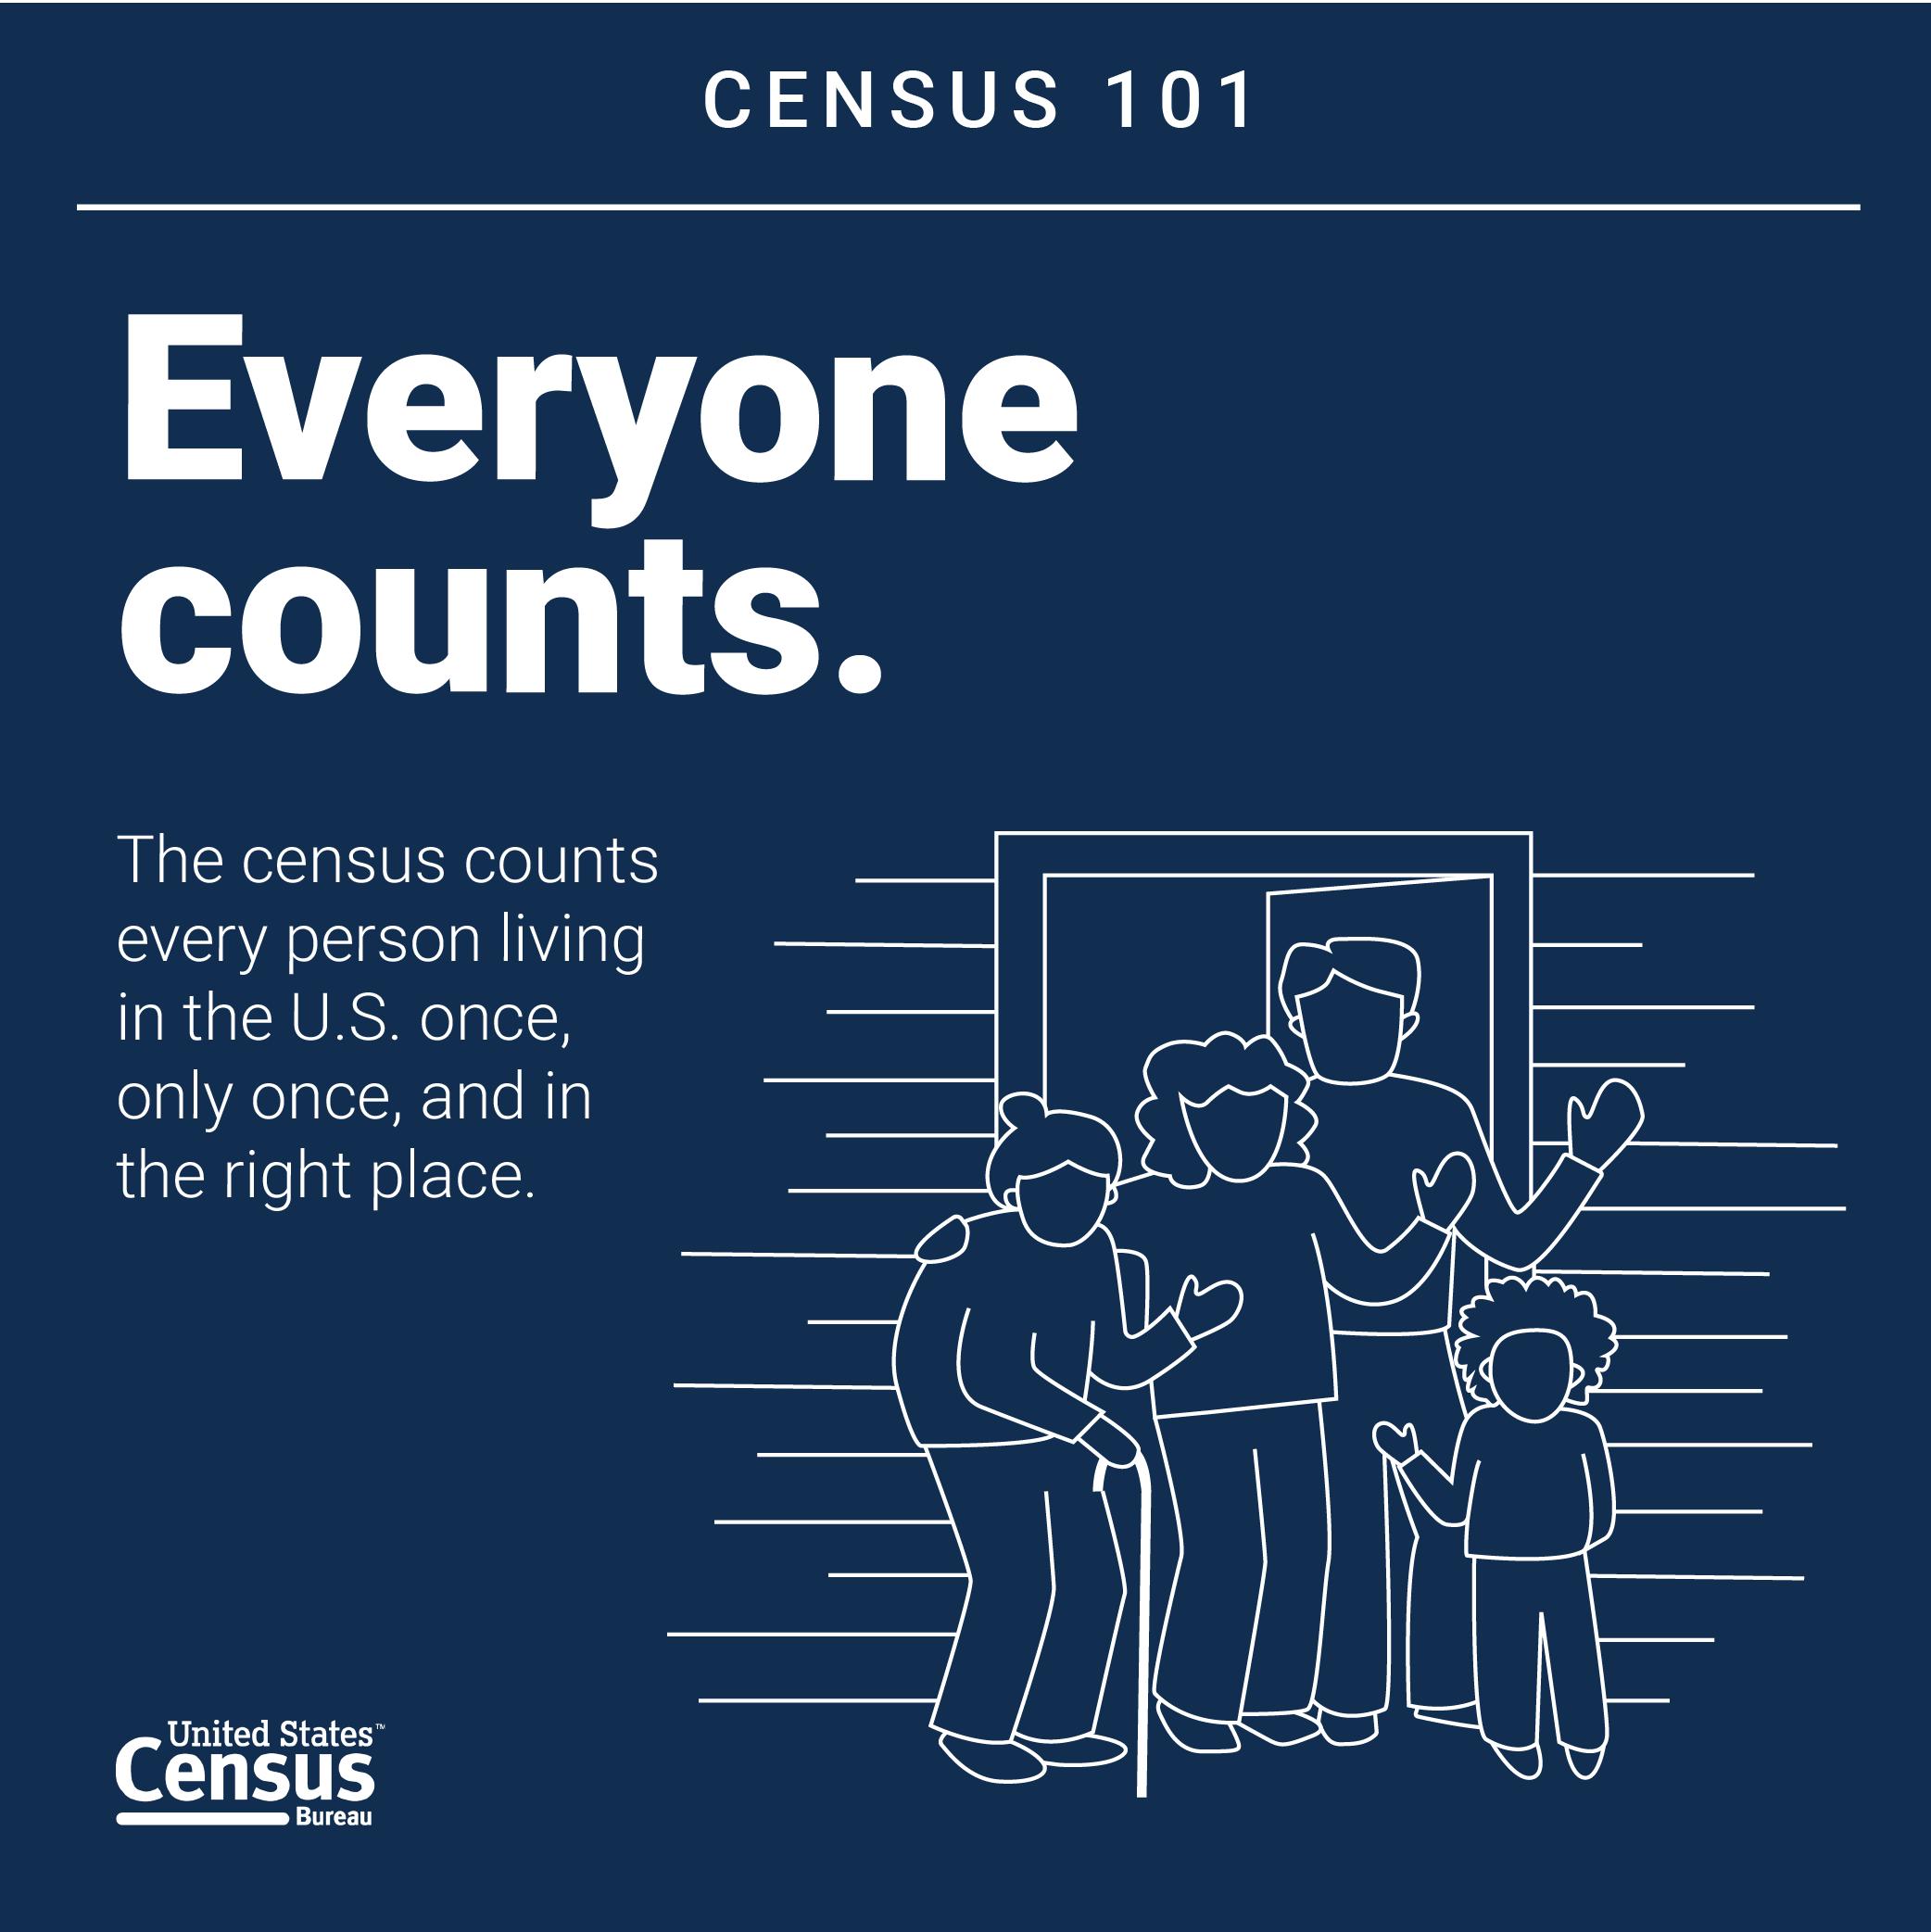 Census101_Graphics_EveryoneCounts.png